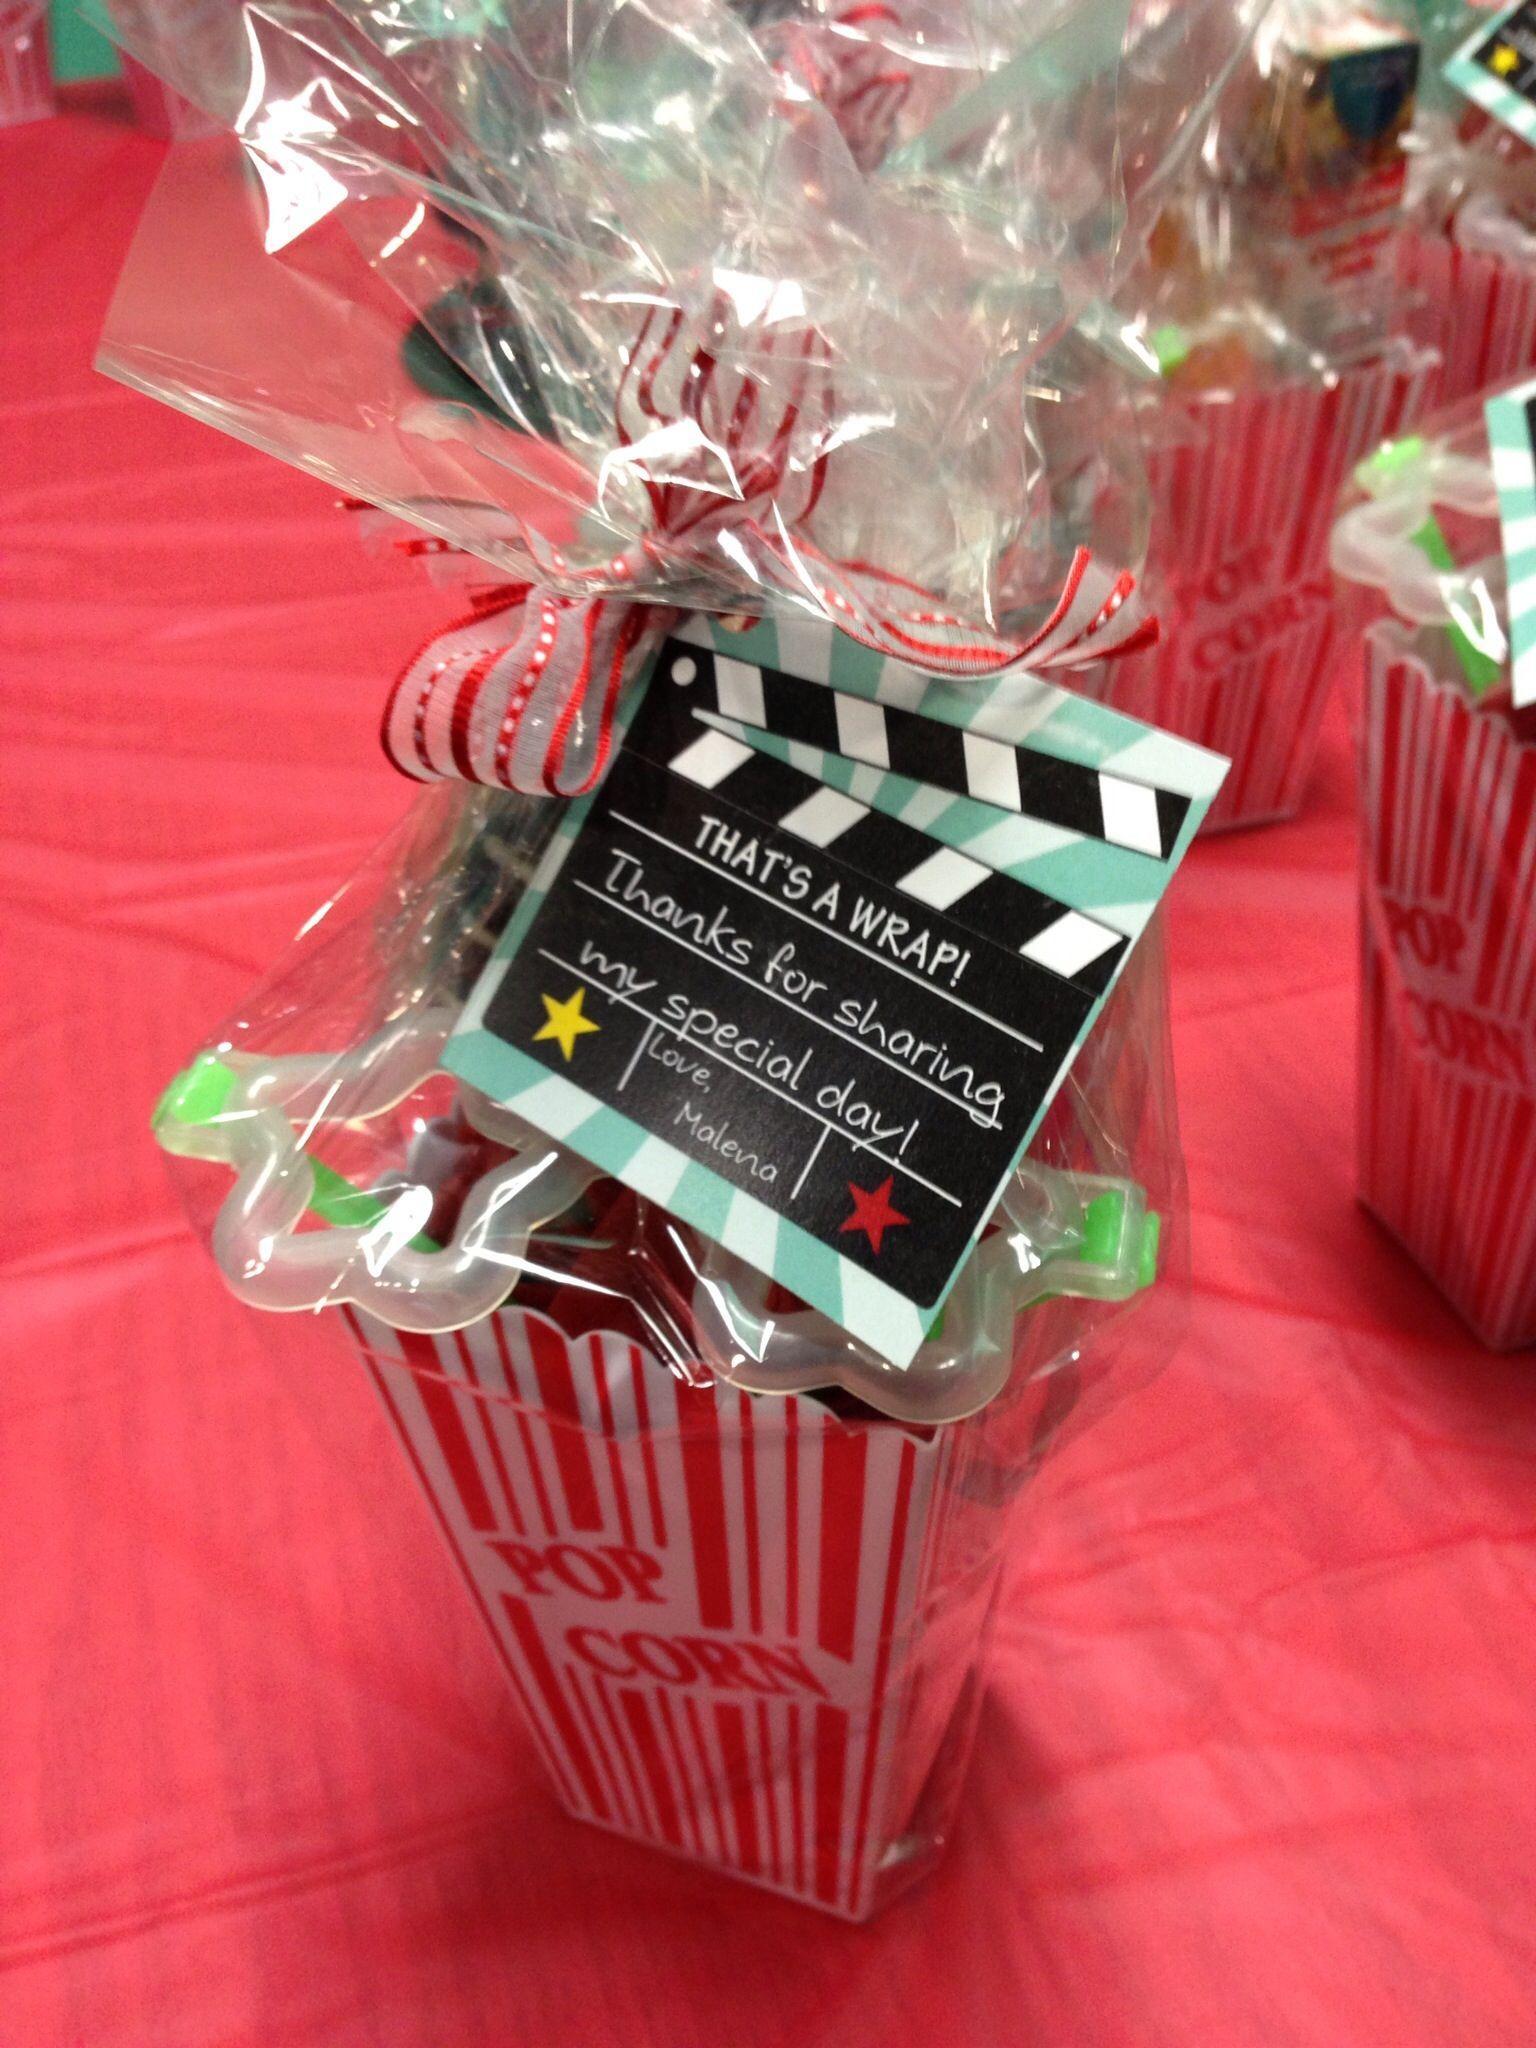 Ec04401c2ffe38b79dcb836d30f55180 Jpg 1 536 2 048 Pixels Movie Night Birthday Party Movie Themed Party Movie Theme Birthday Party